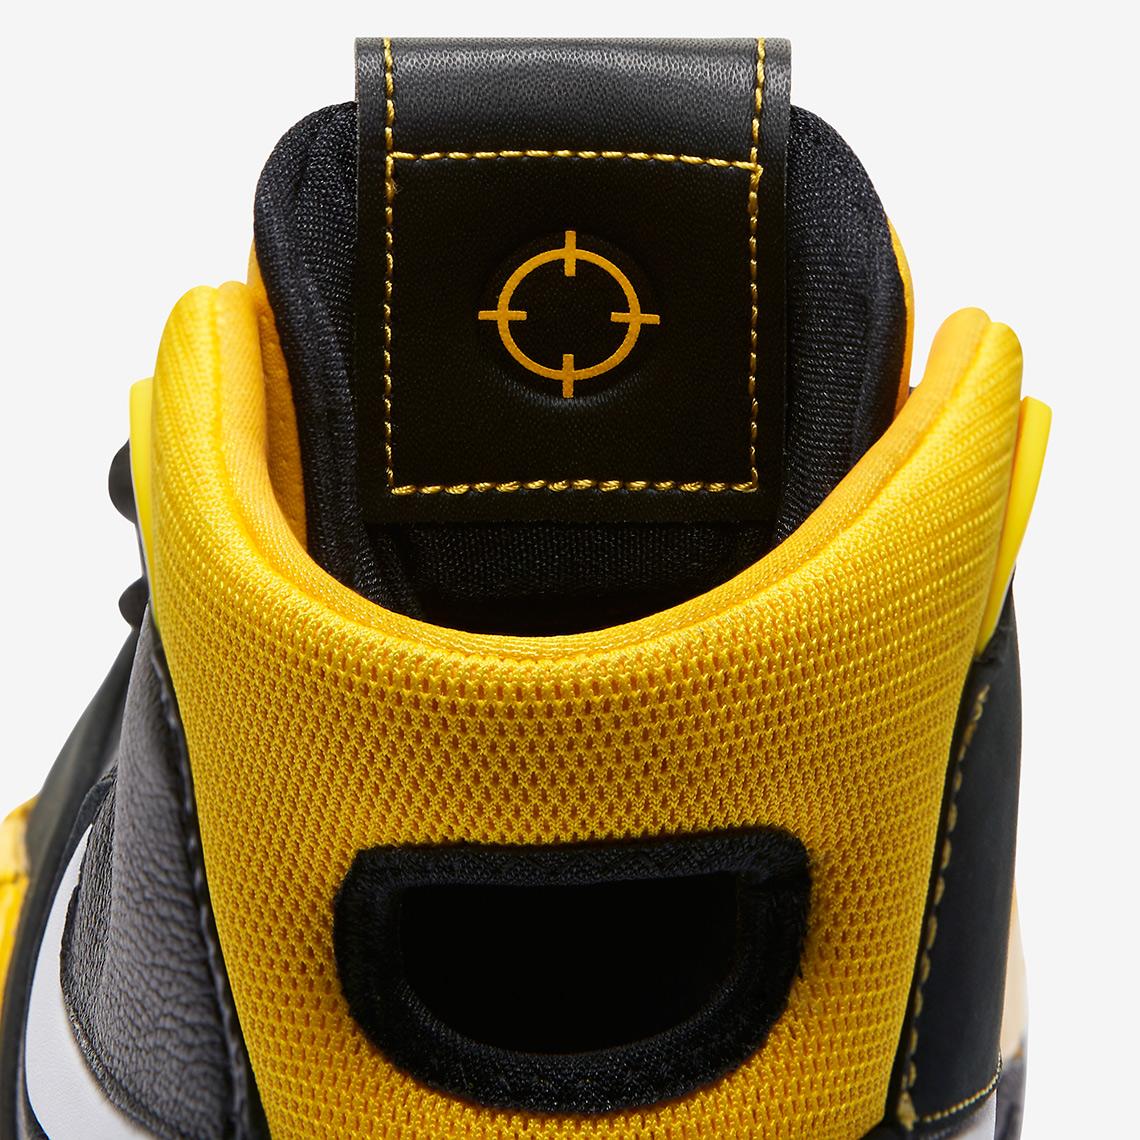 nike-zoom-kobe-1-protro-black-yellow-release-date-2.jpg